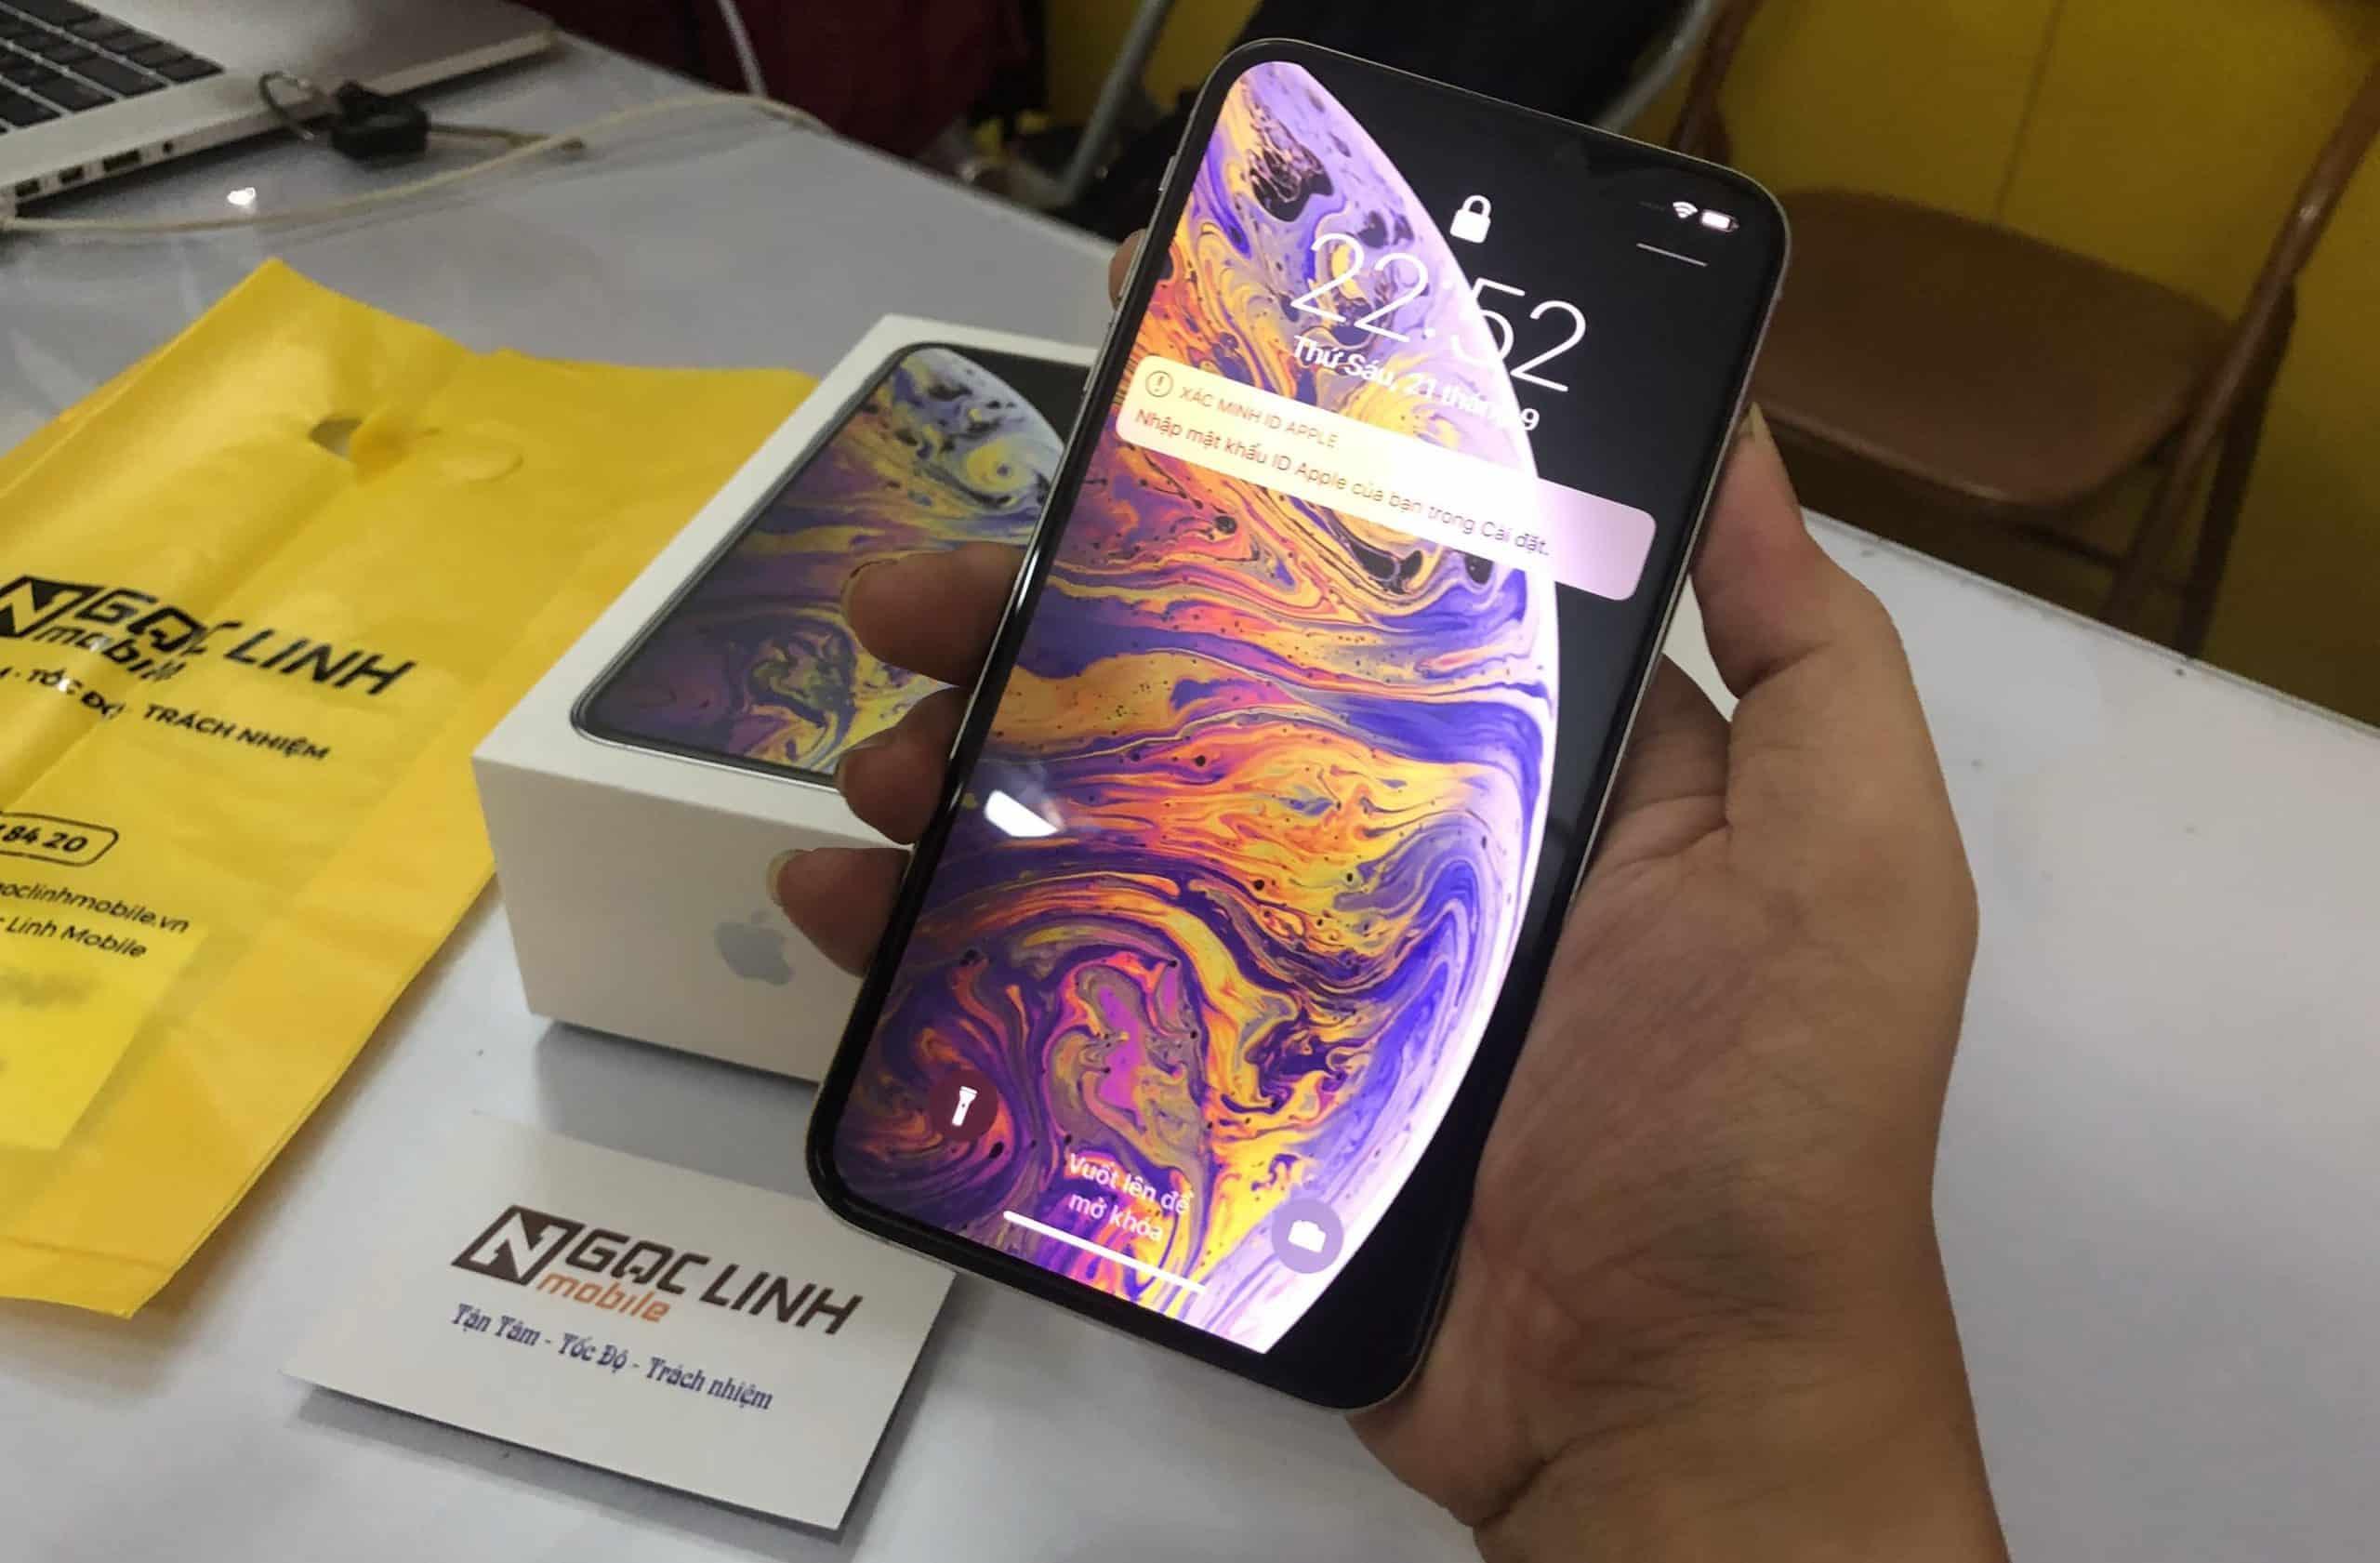 iPhone Xs Max 64gb, iPhone Xs Max 256gb, iPhone Xs Max 512gb, iPhone Xs Max 64gb 100%